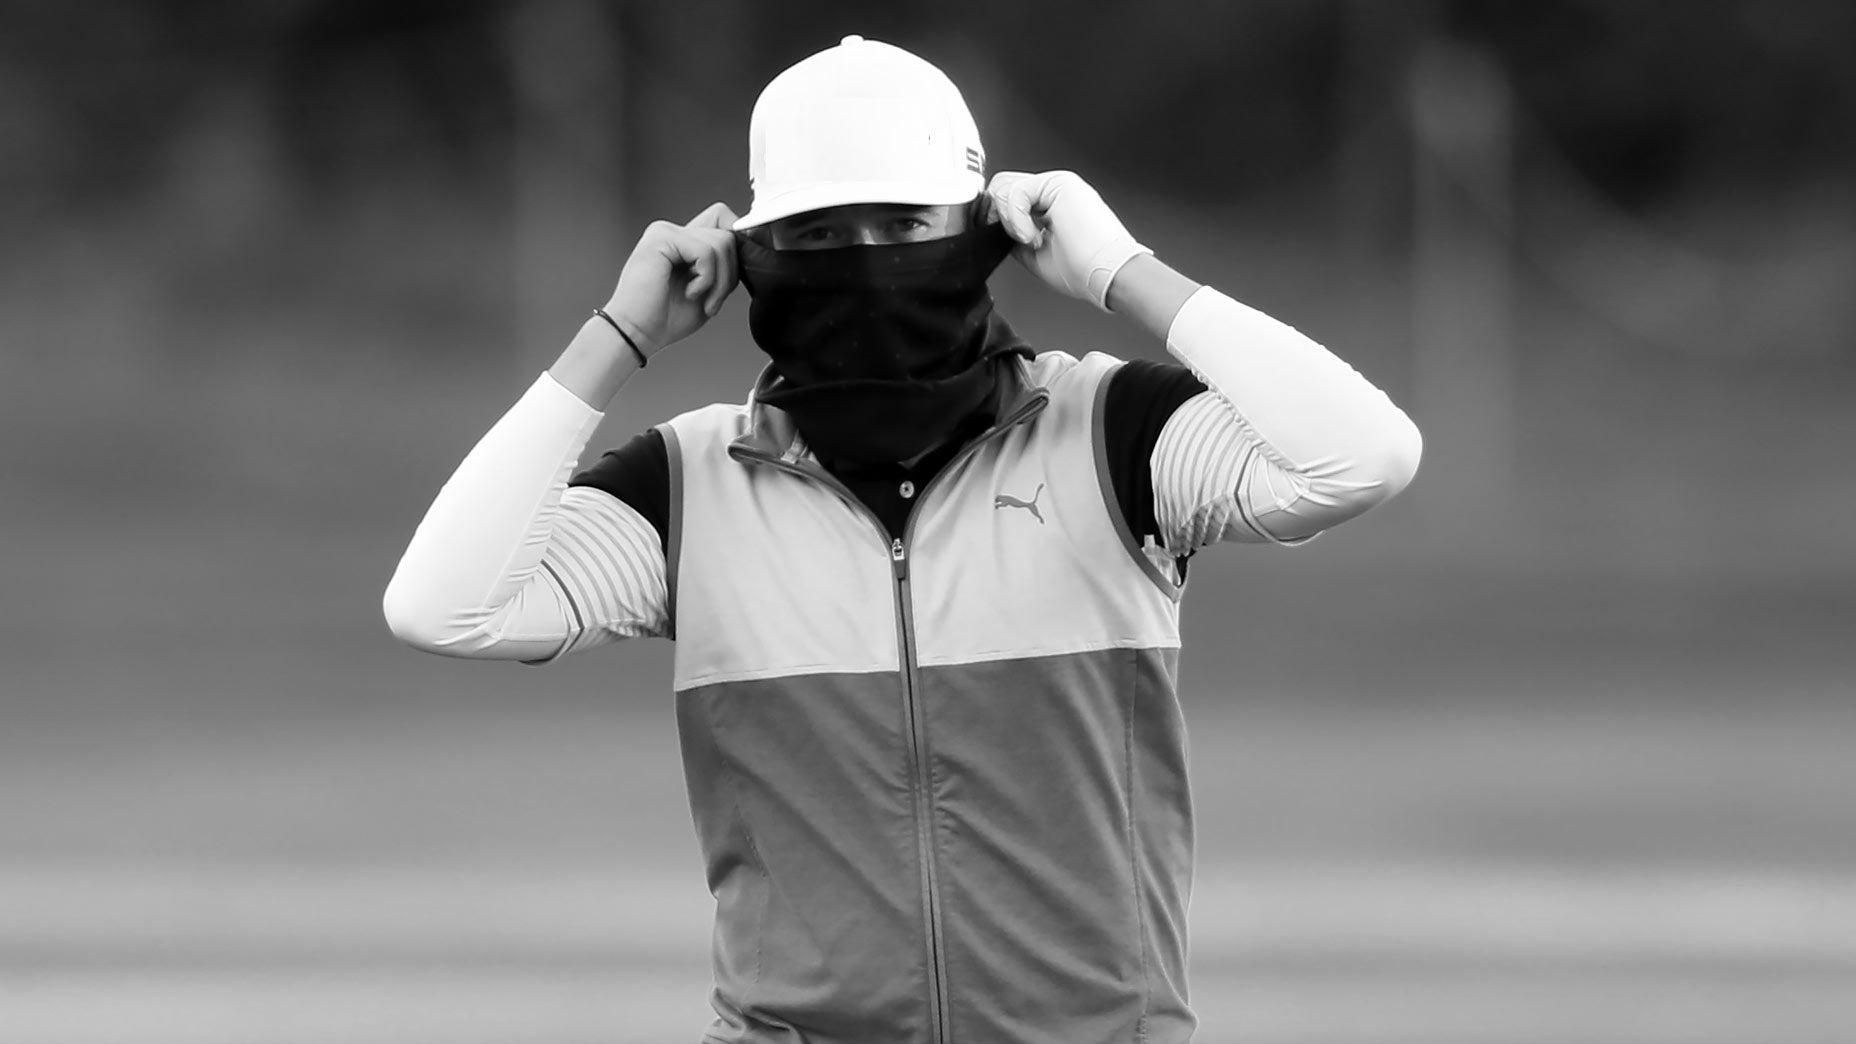 masked golfer